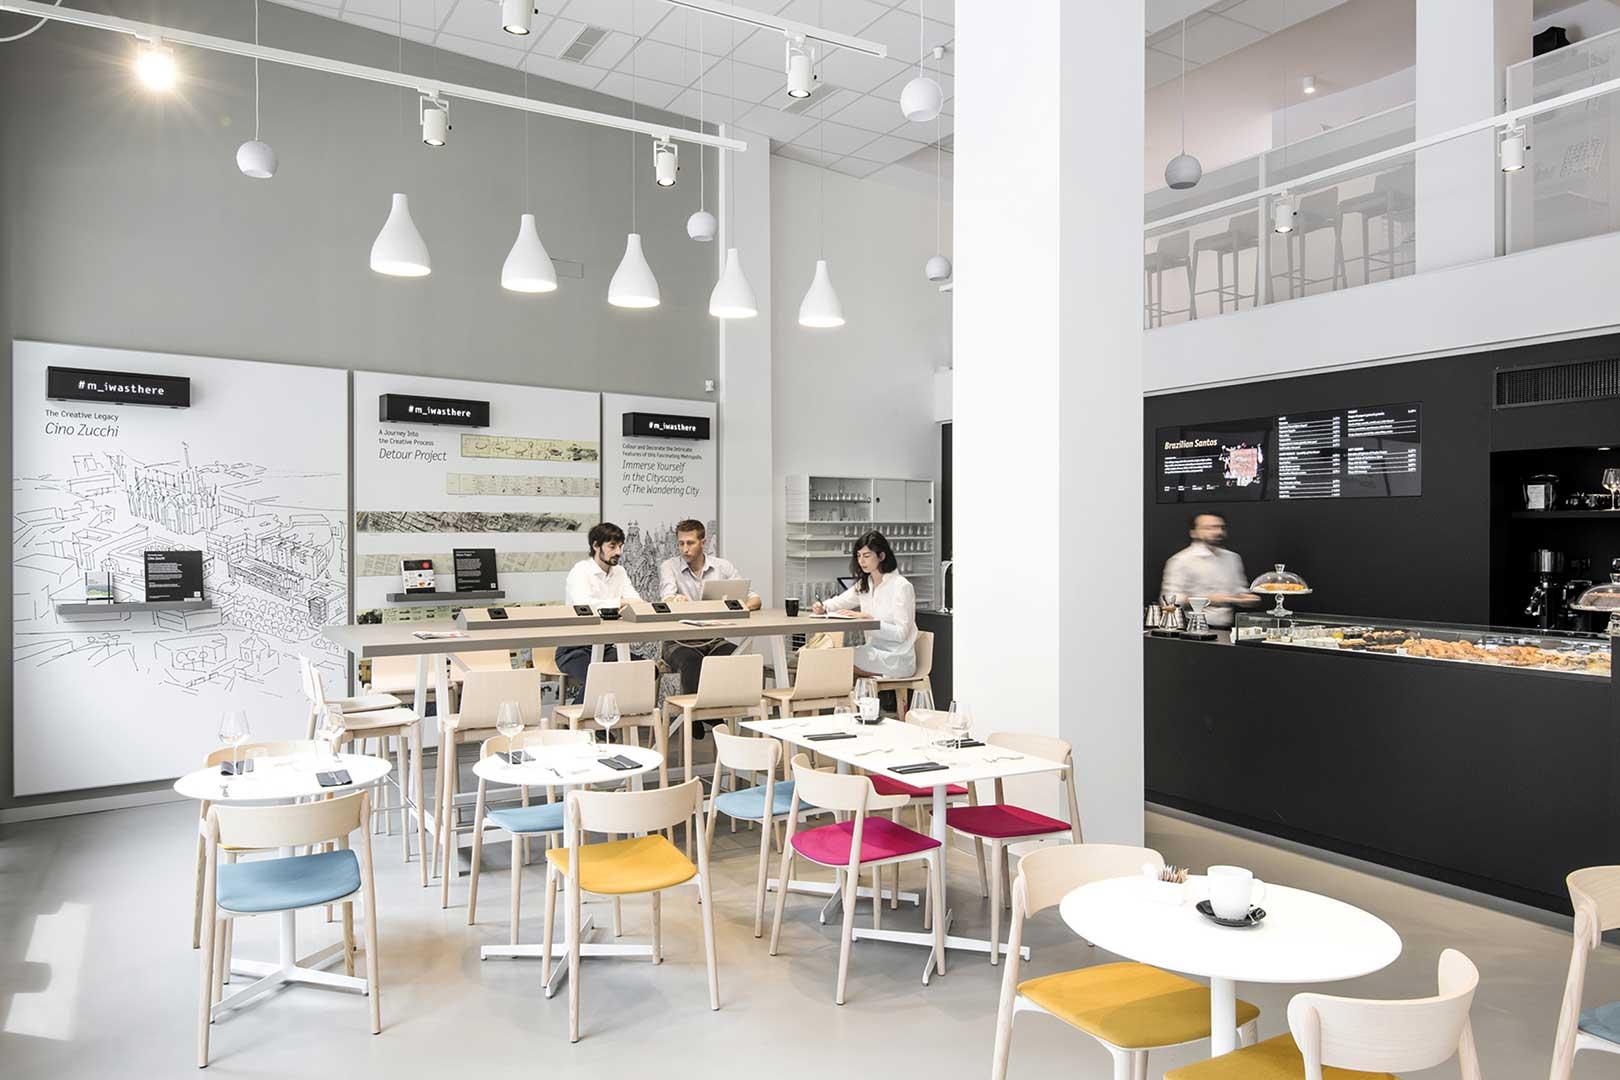 Moleskine Cafe Milano Coworking